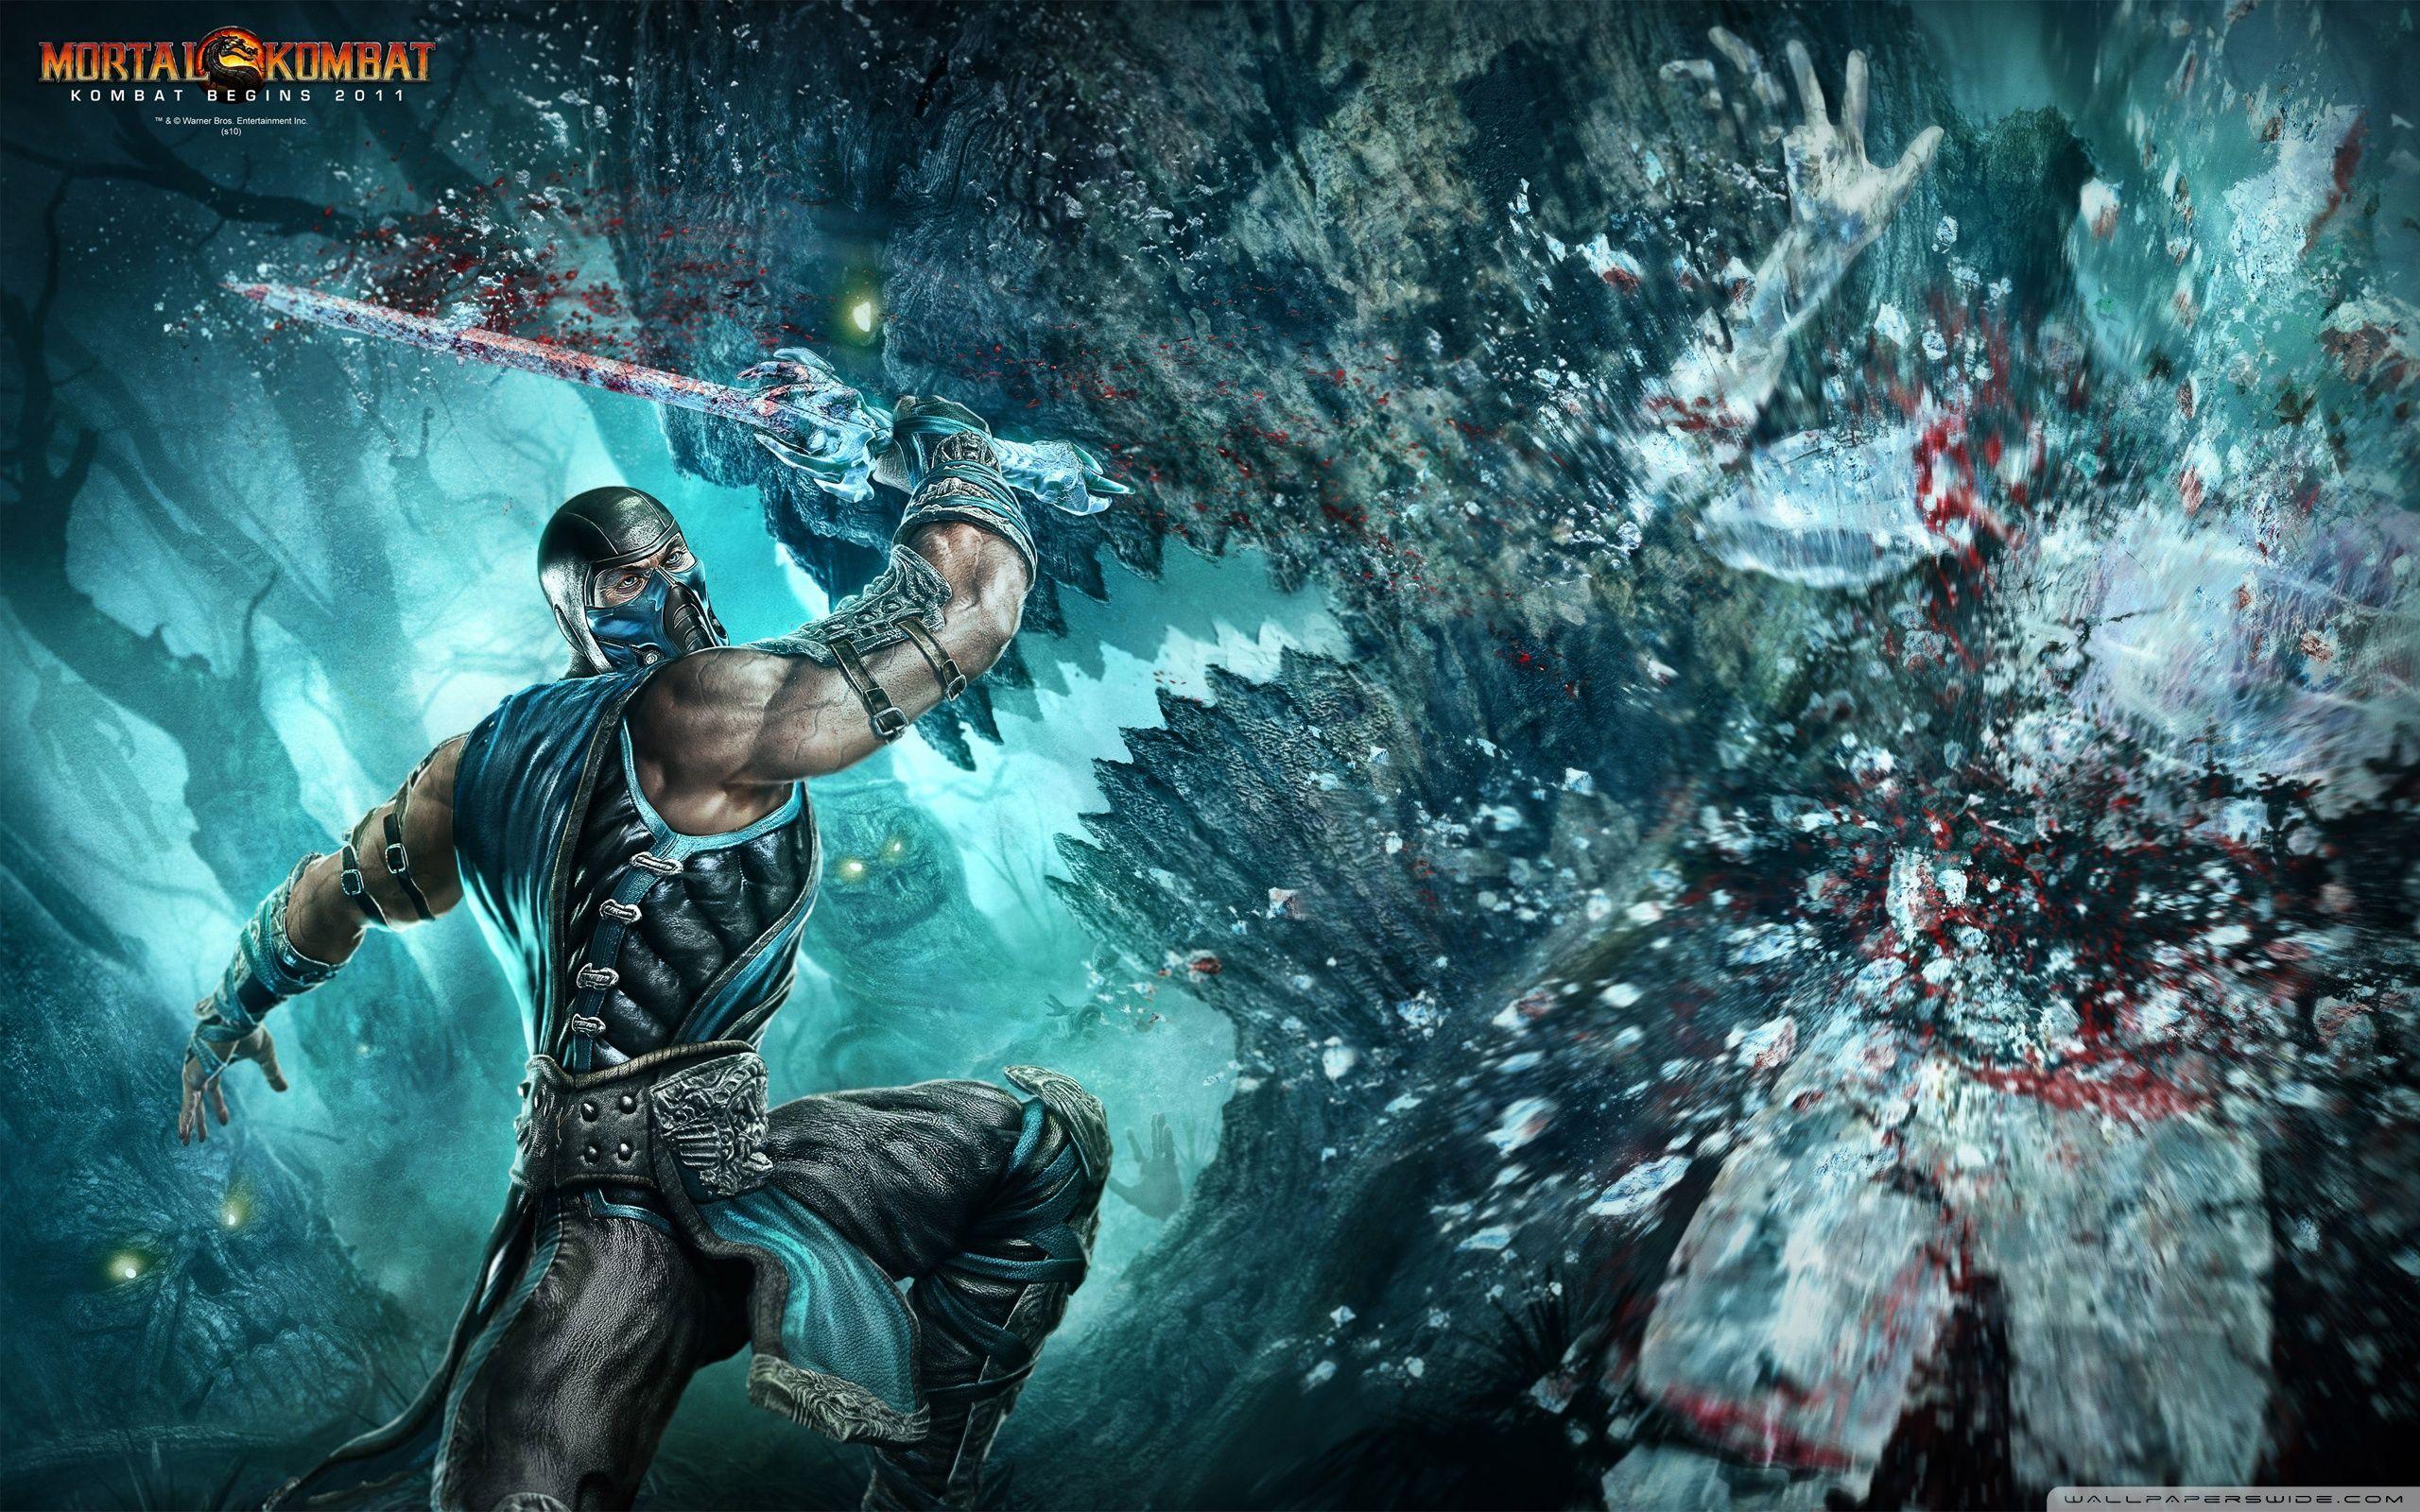 Mortal Kombat Scorpion Vs Sub Zero Wallpapers - Wallpaper Cave